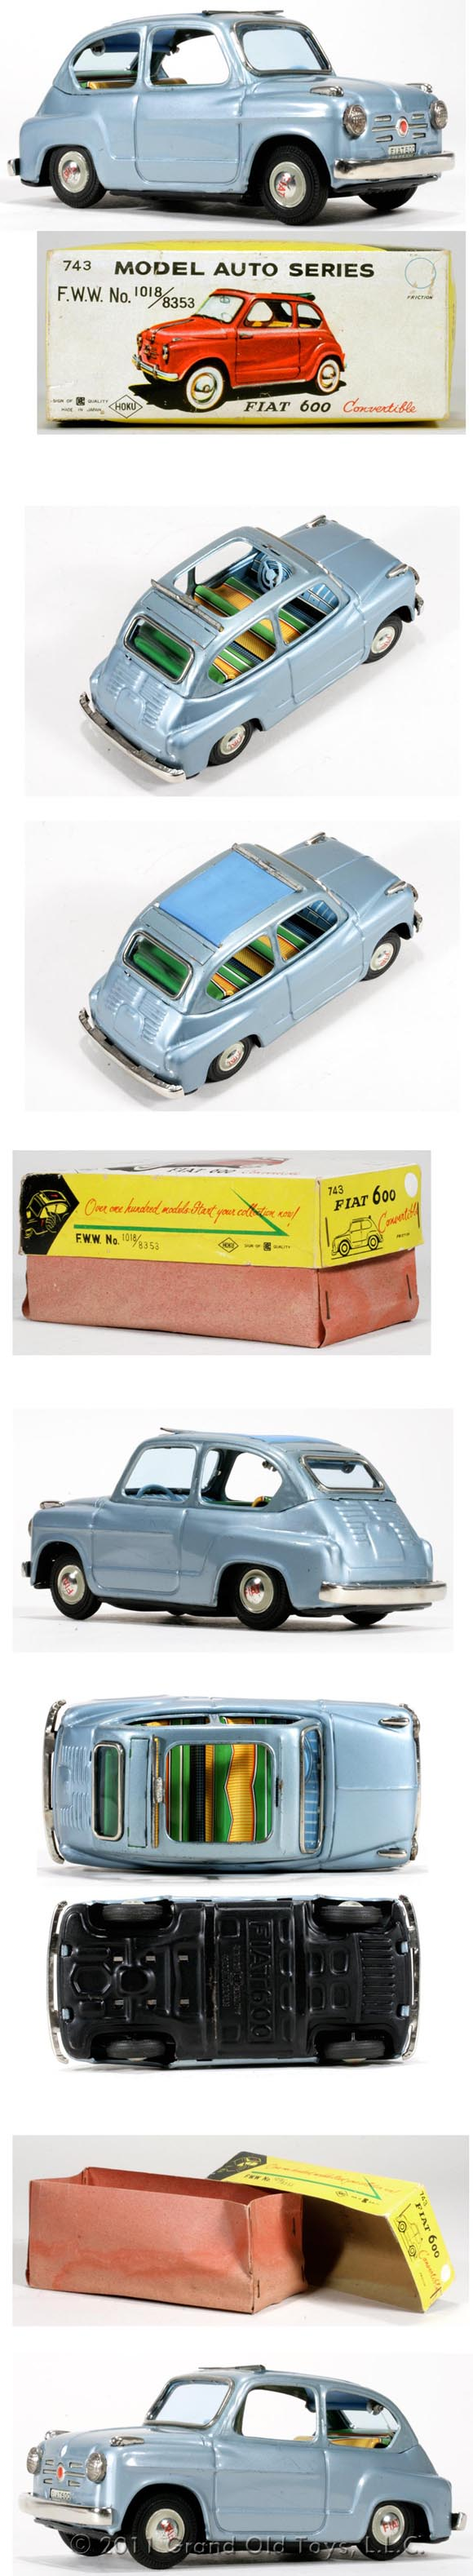 drive Fiat 600 convertible